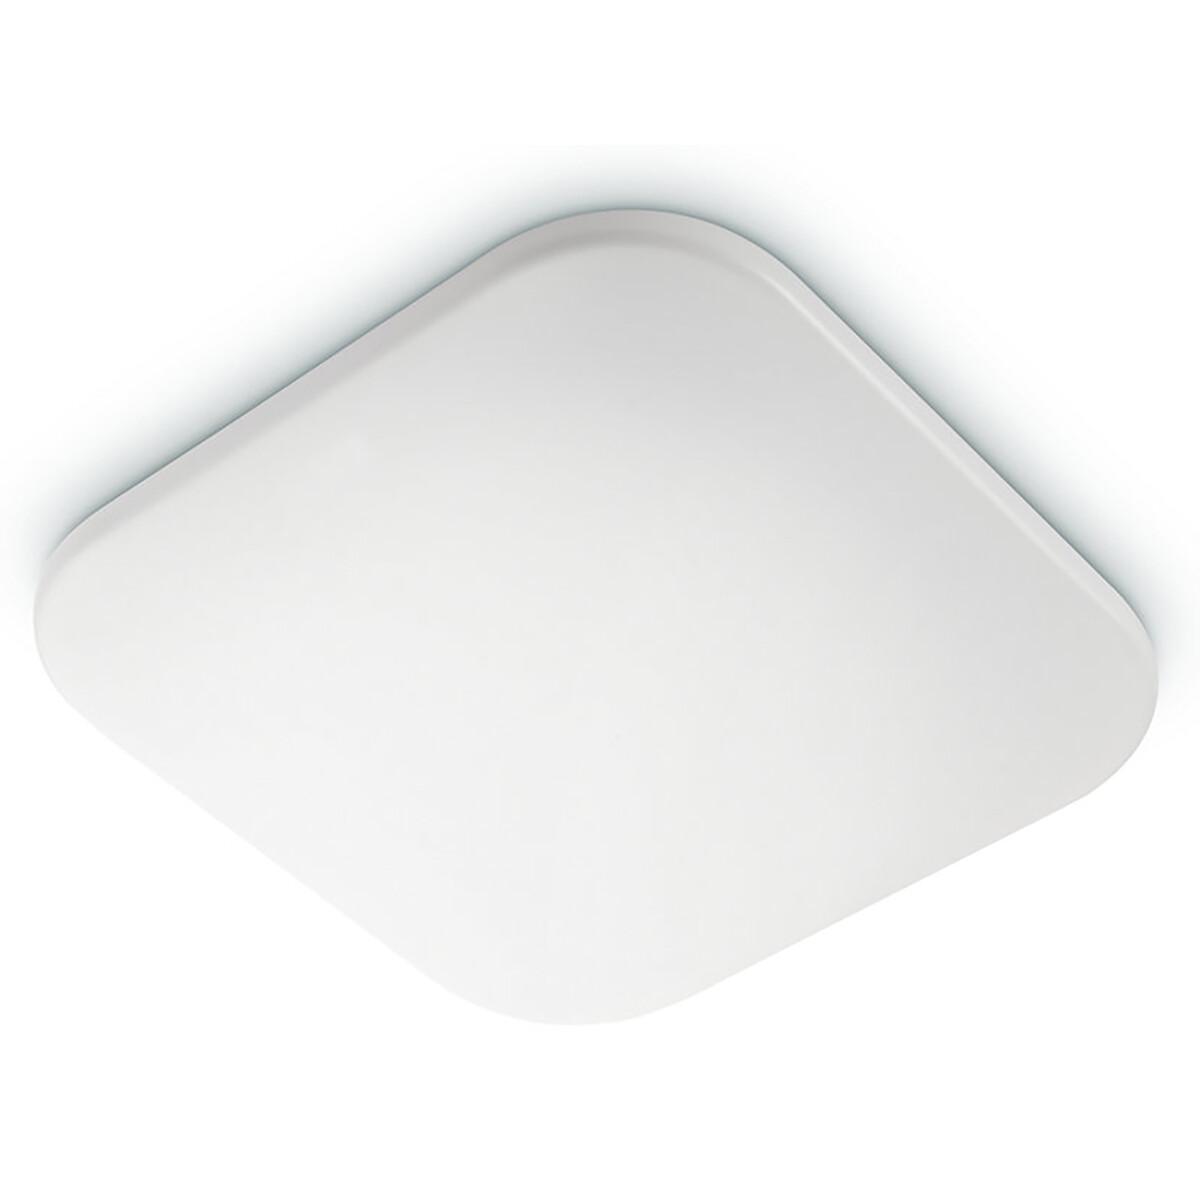 PHILIPS - LED Plafondlamp - MyLiving Mauve - 17W - Warm Wit 2700K - Vierkant - Mat Wit - Kunststof